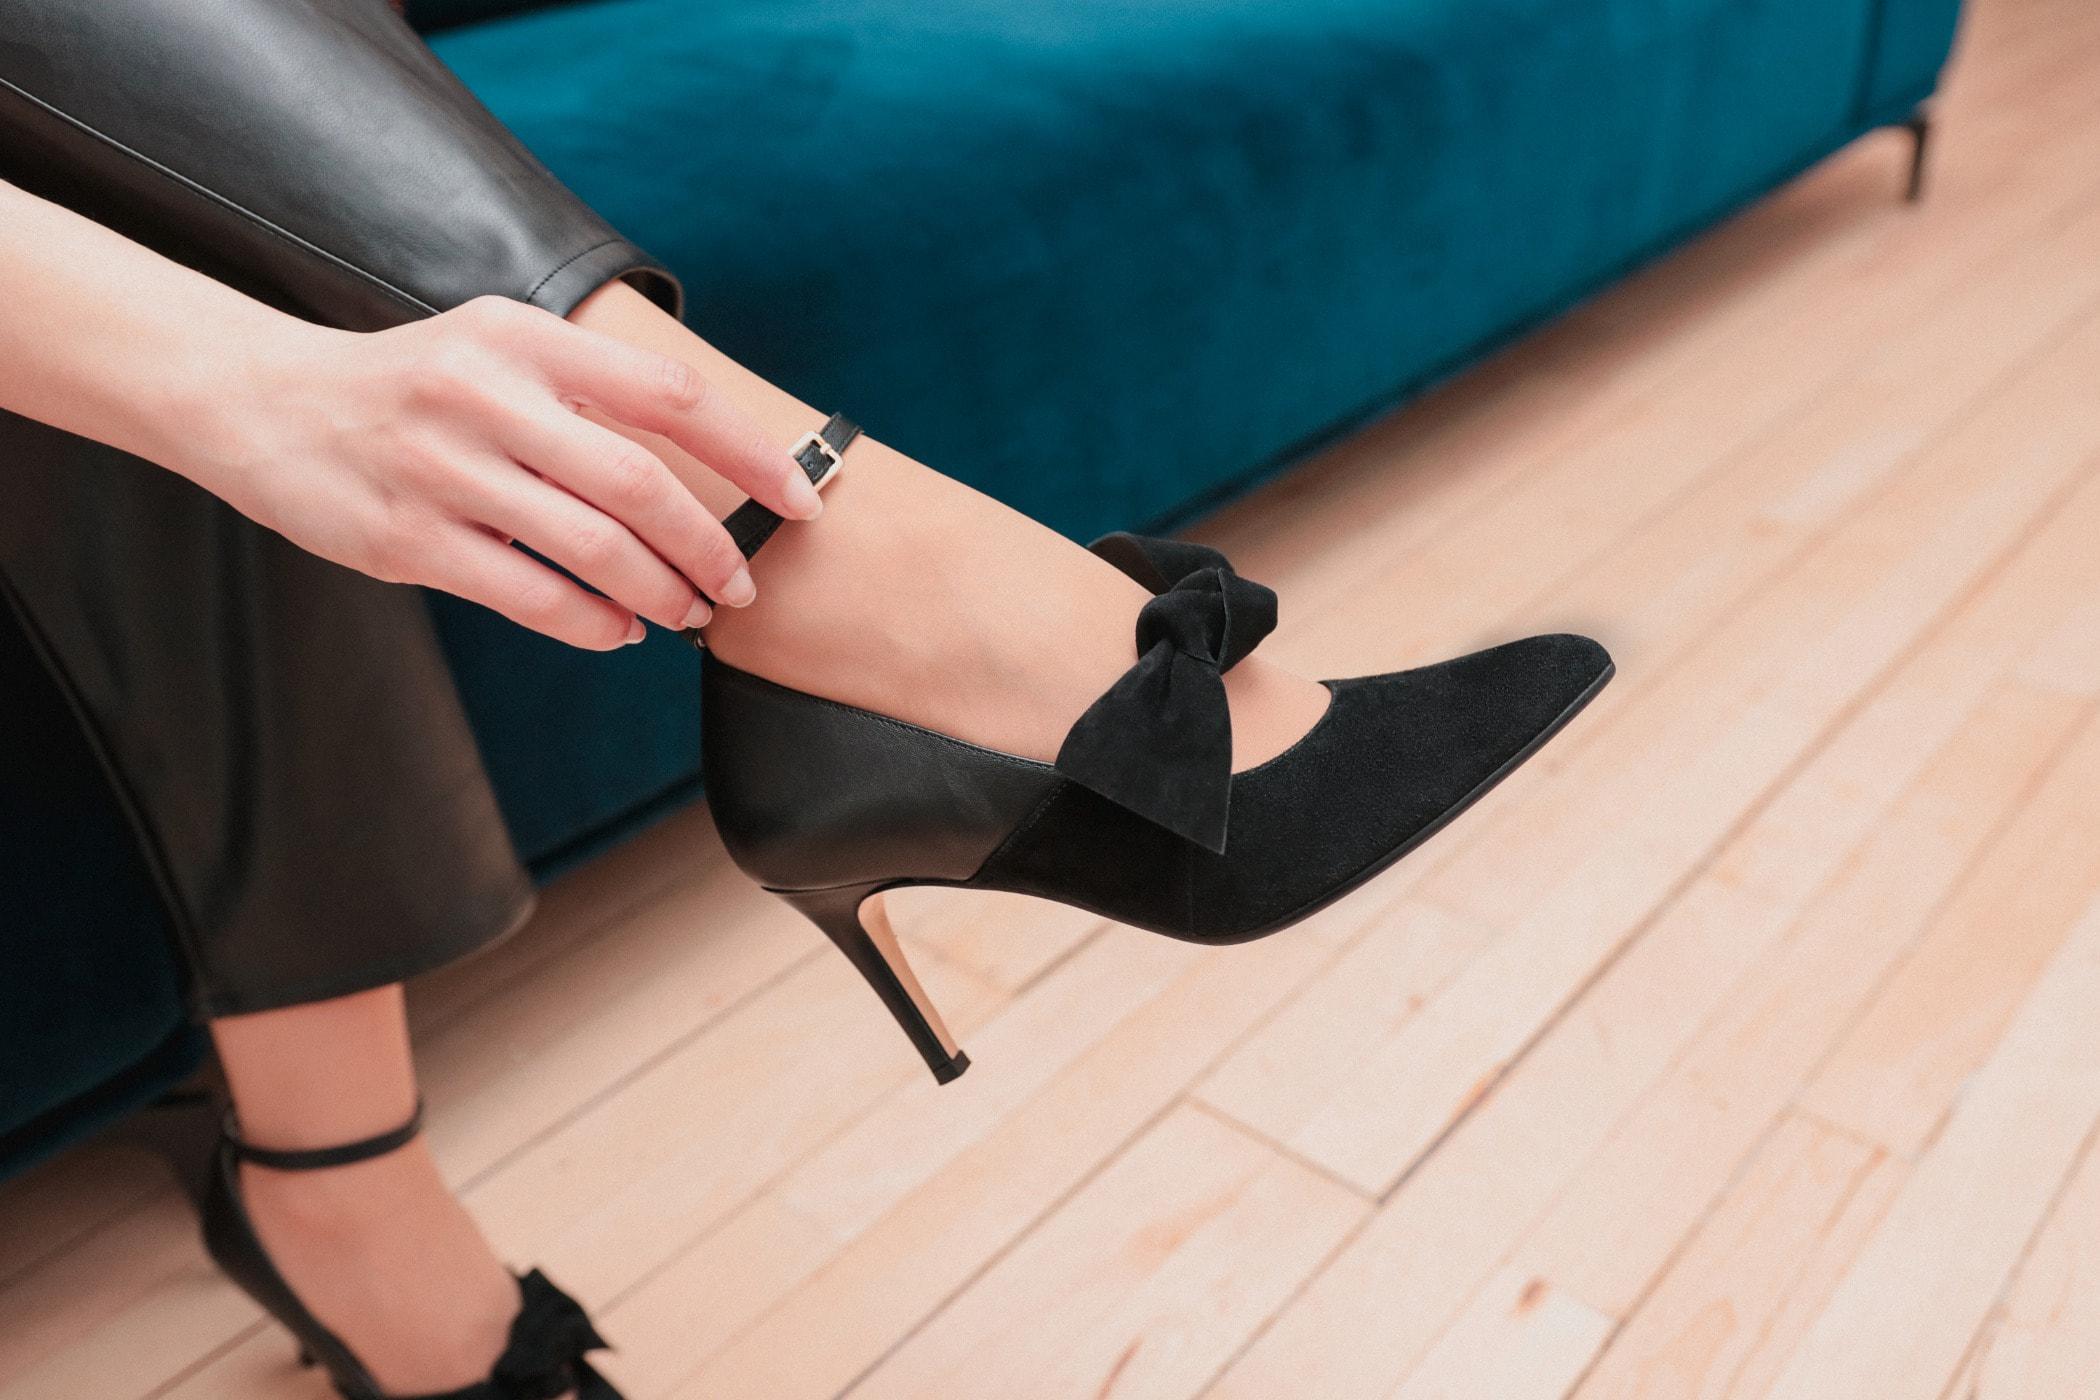 Human leg, High heels, Thigh, Joint, Foot, Shoe, Ankle, Black, Footwear